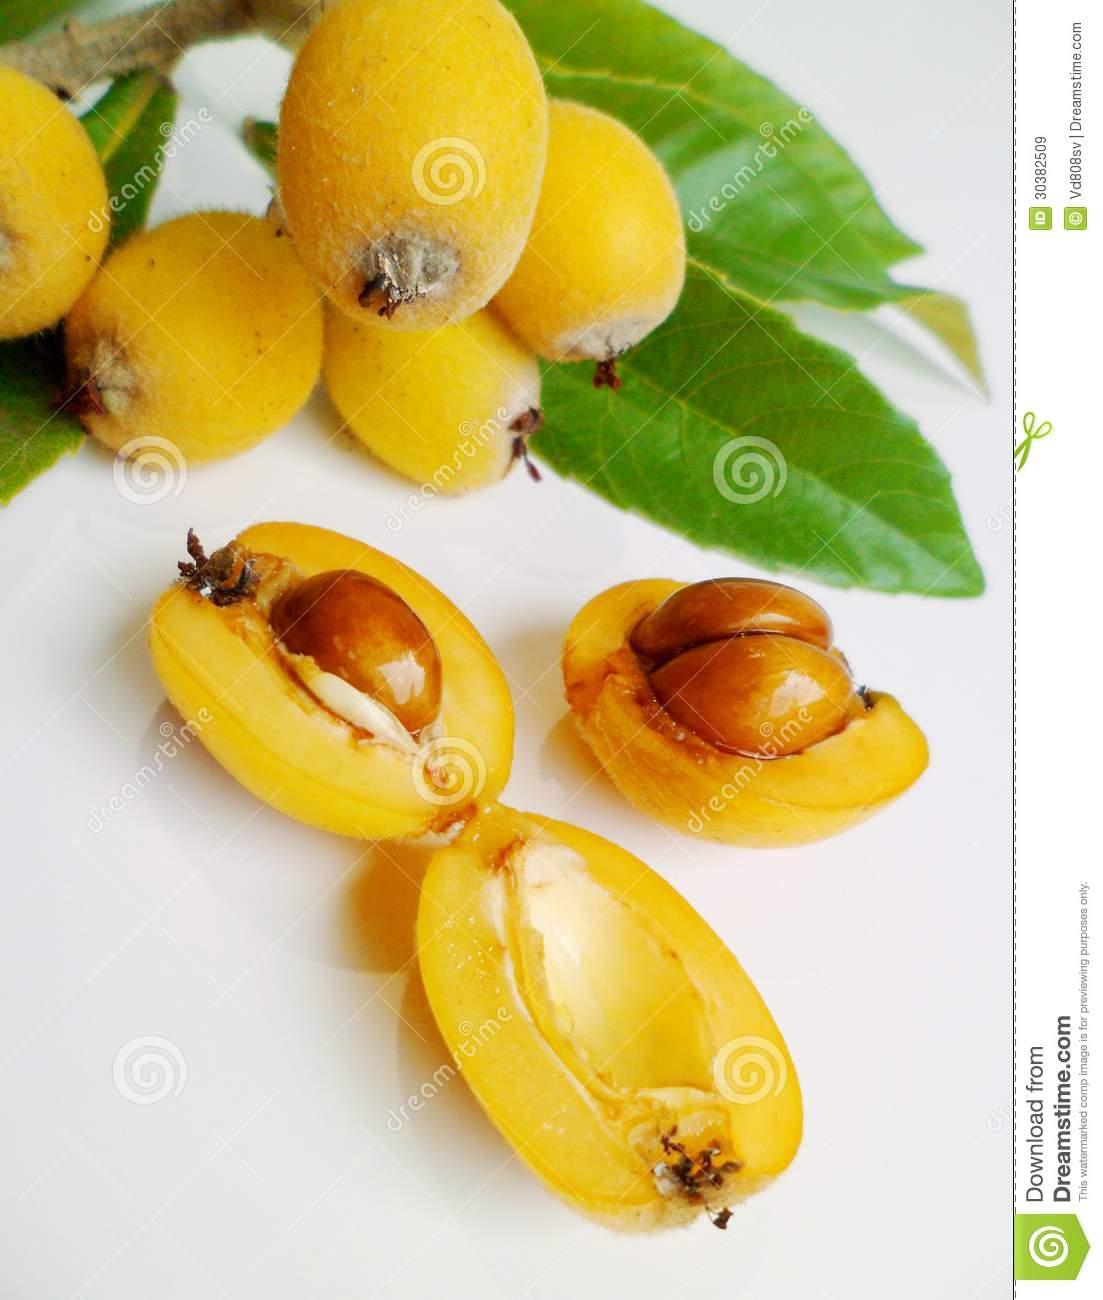 Loquat (Eriobotrya Japonica) Royalty Free Stock Images.